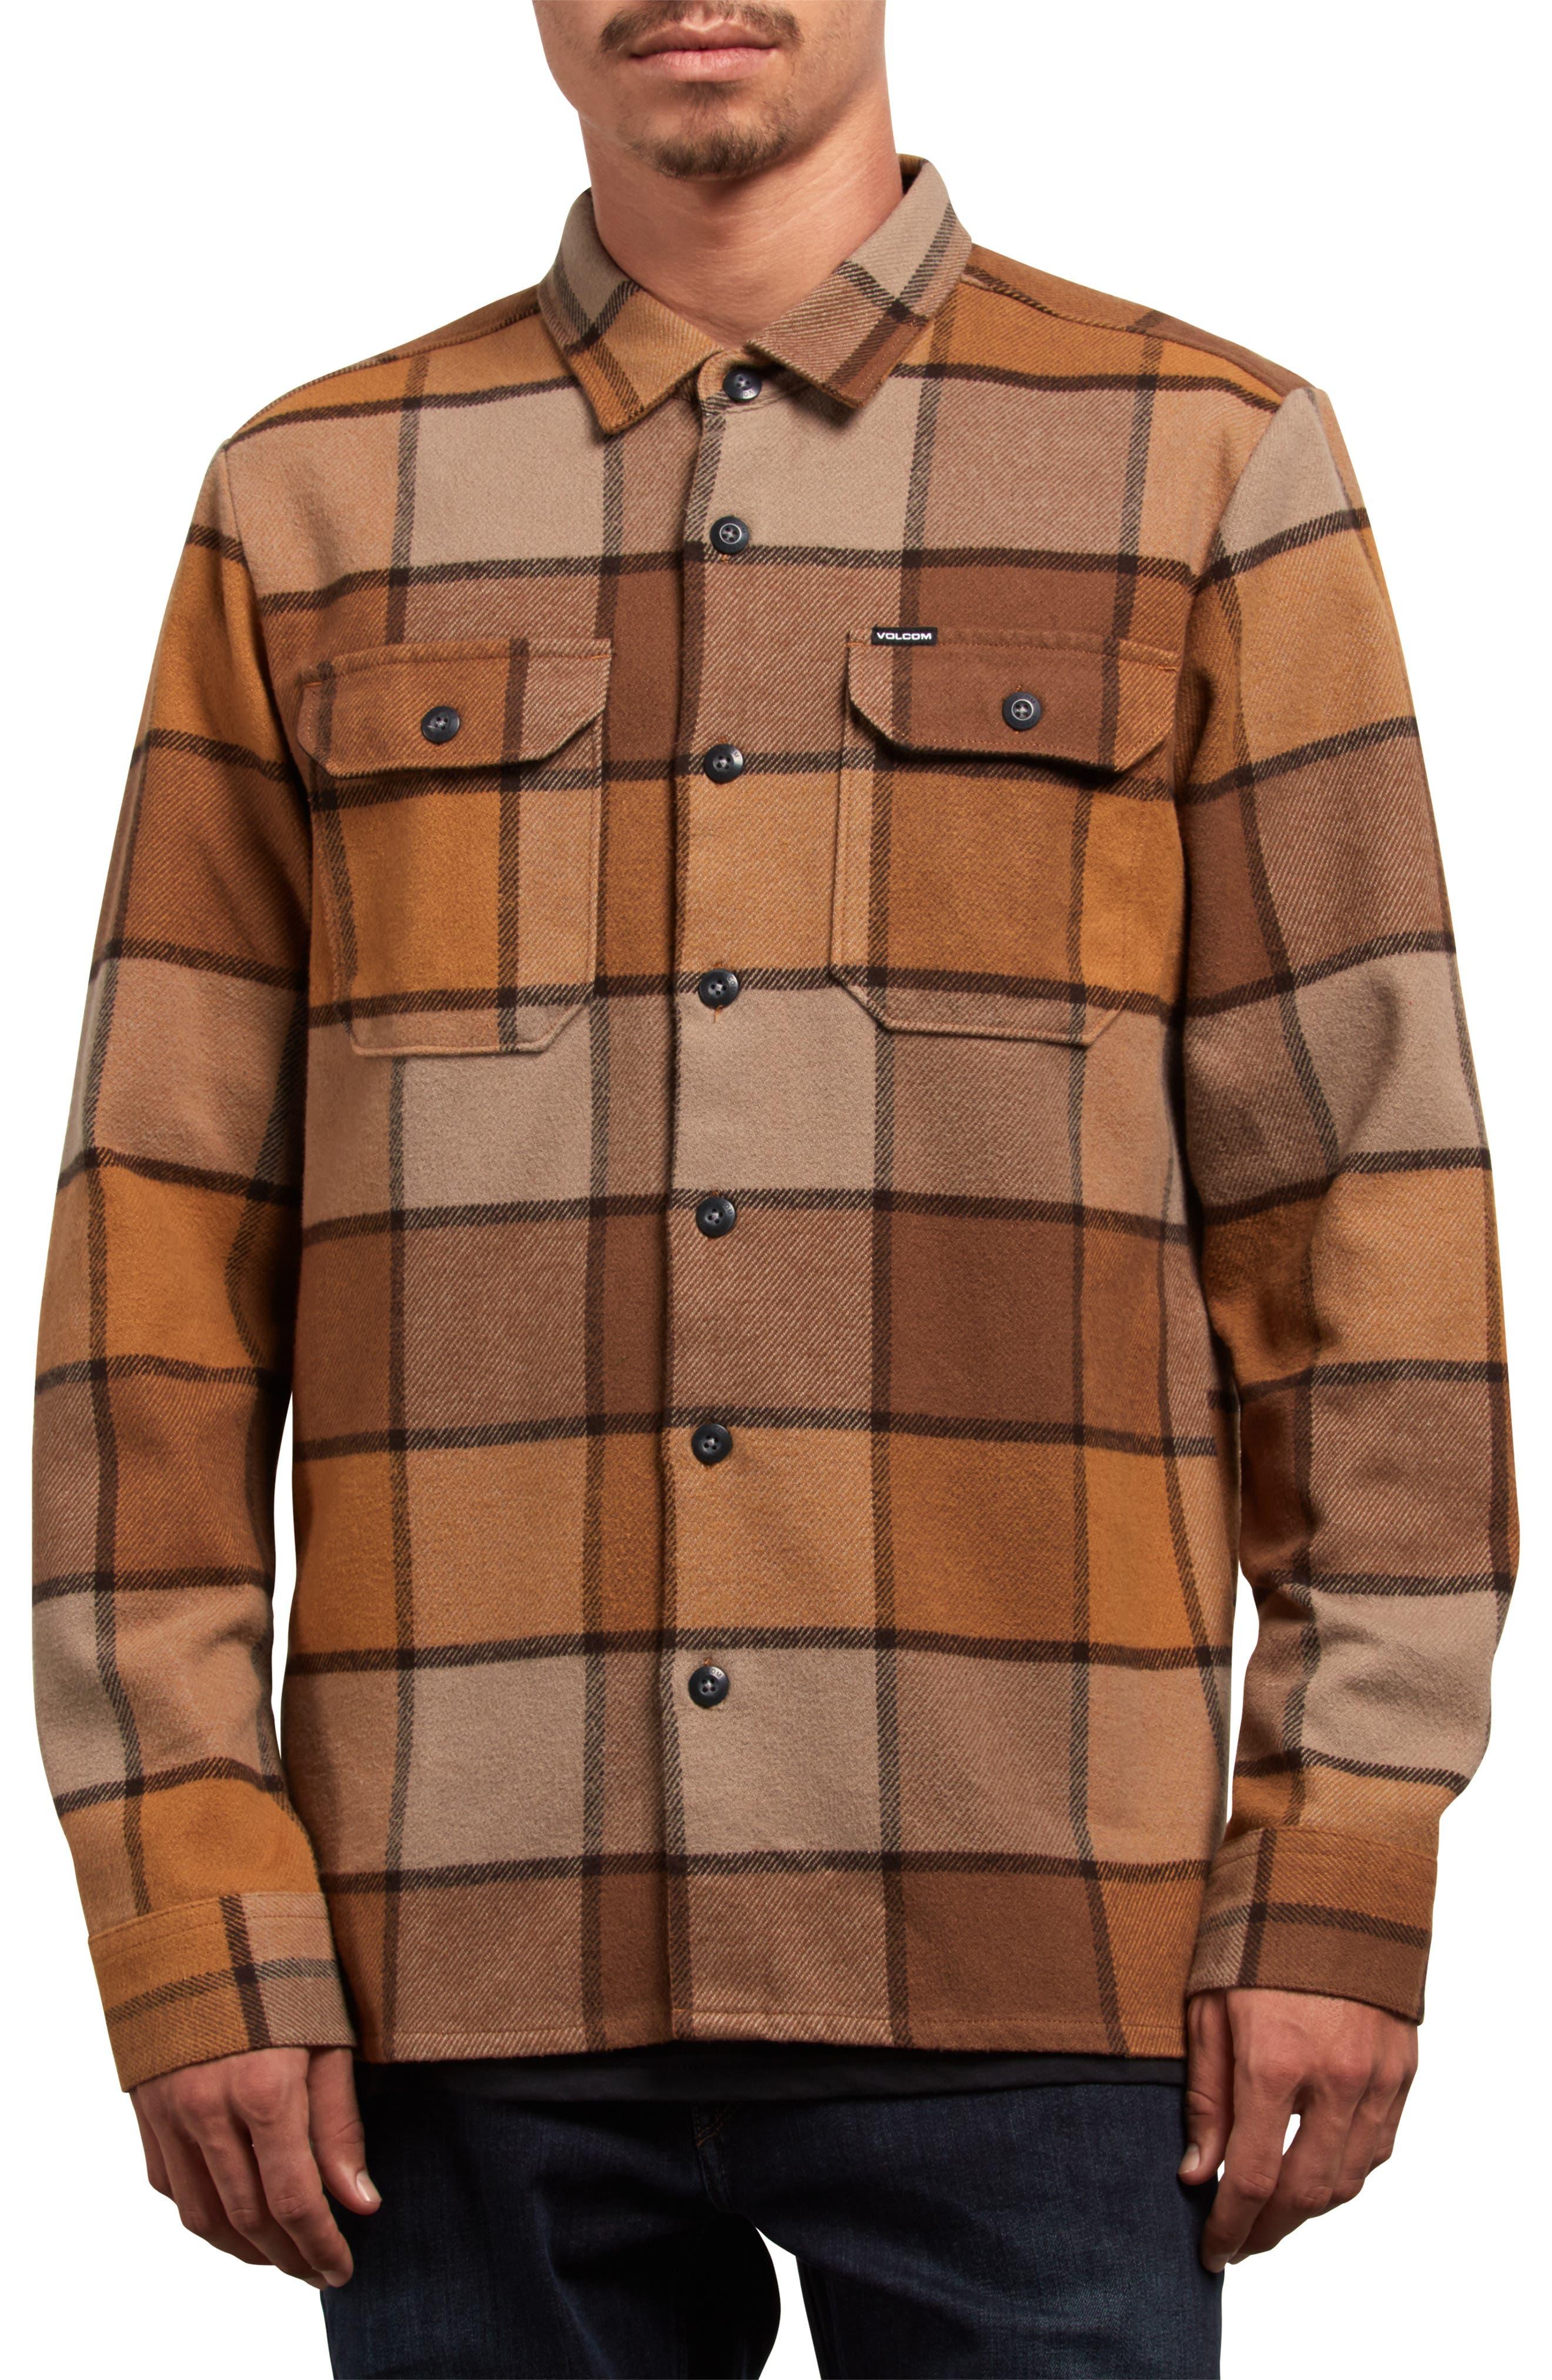 Randower Plaid Flannel Shirt,                             Main thumbnail 1, color,                             MUD